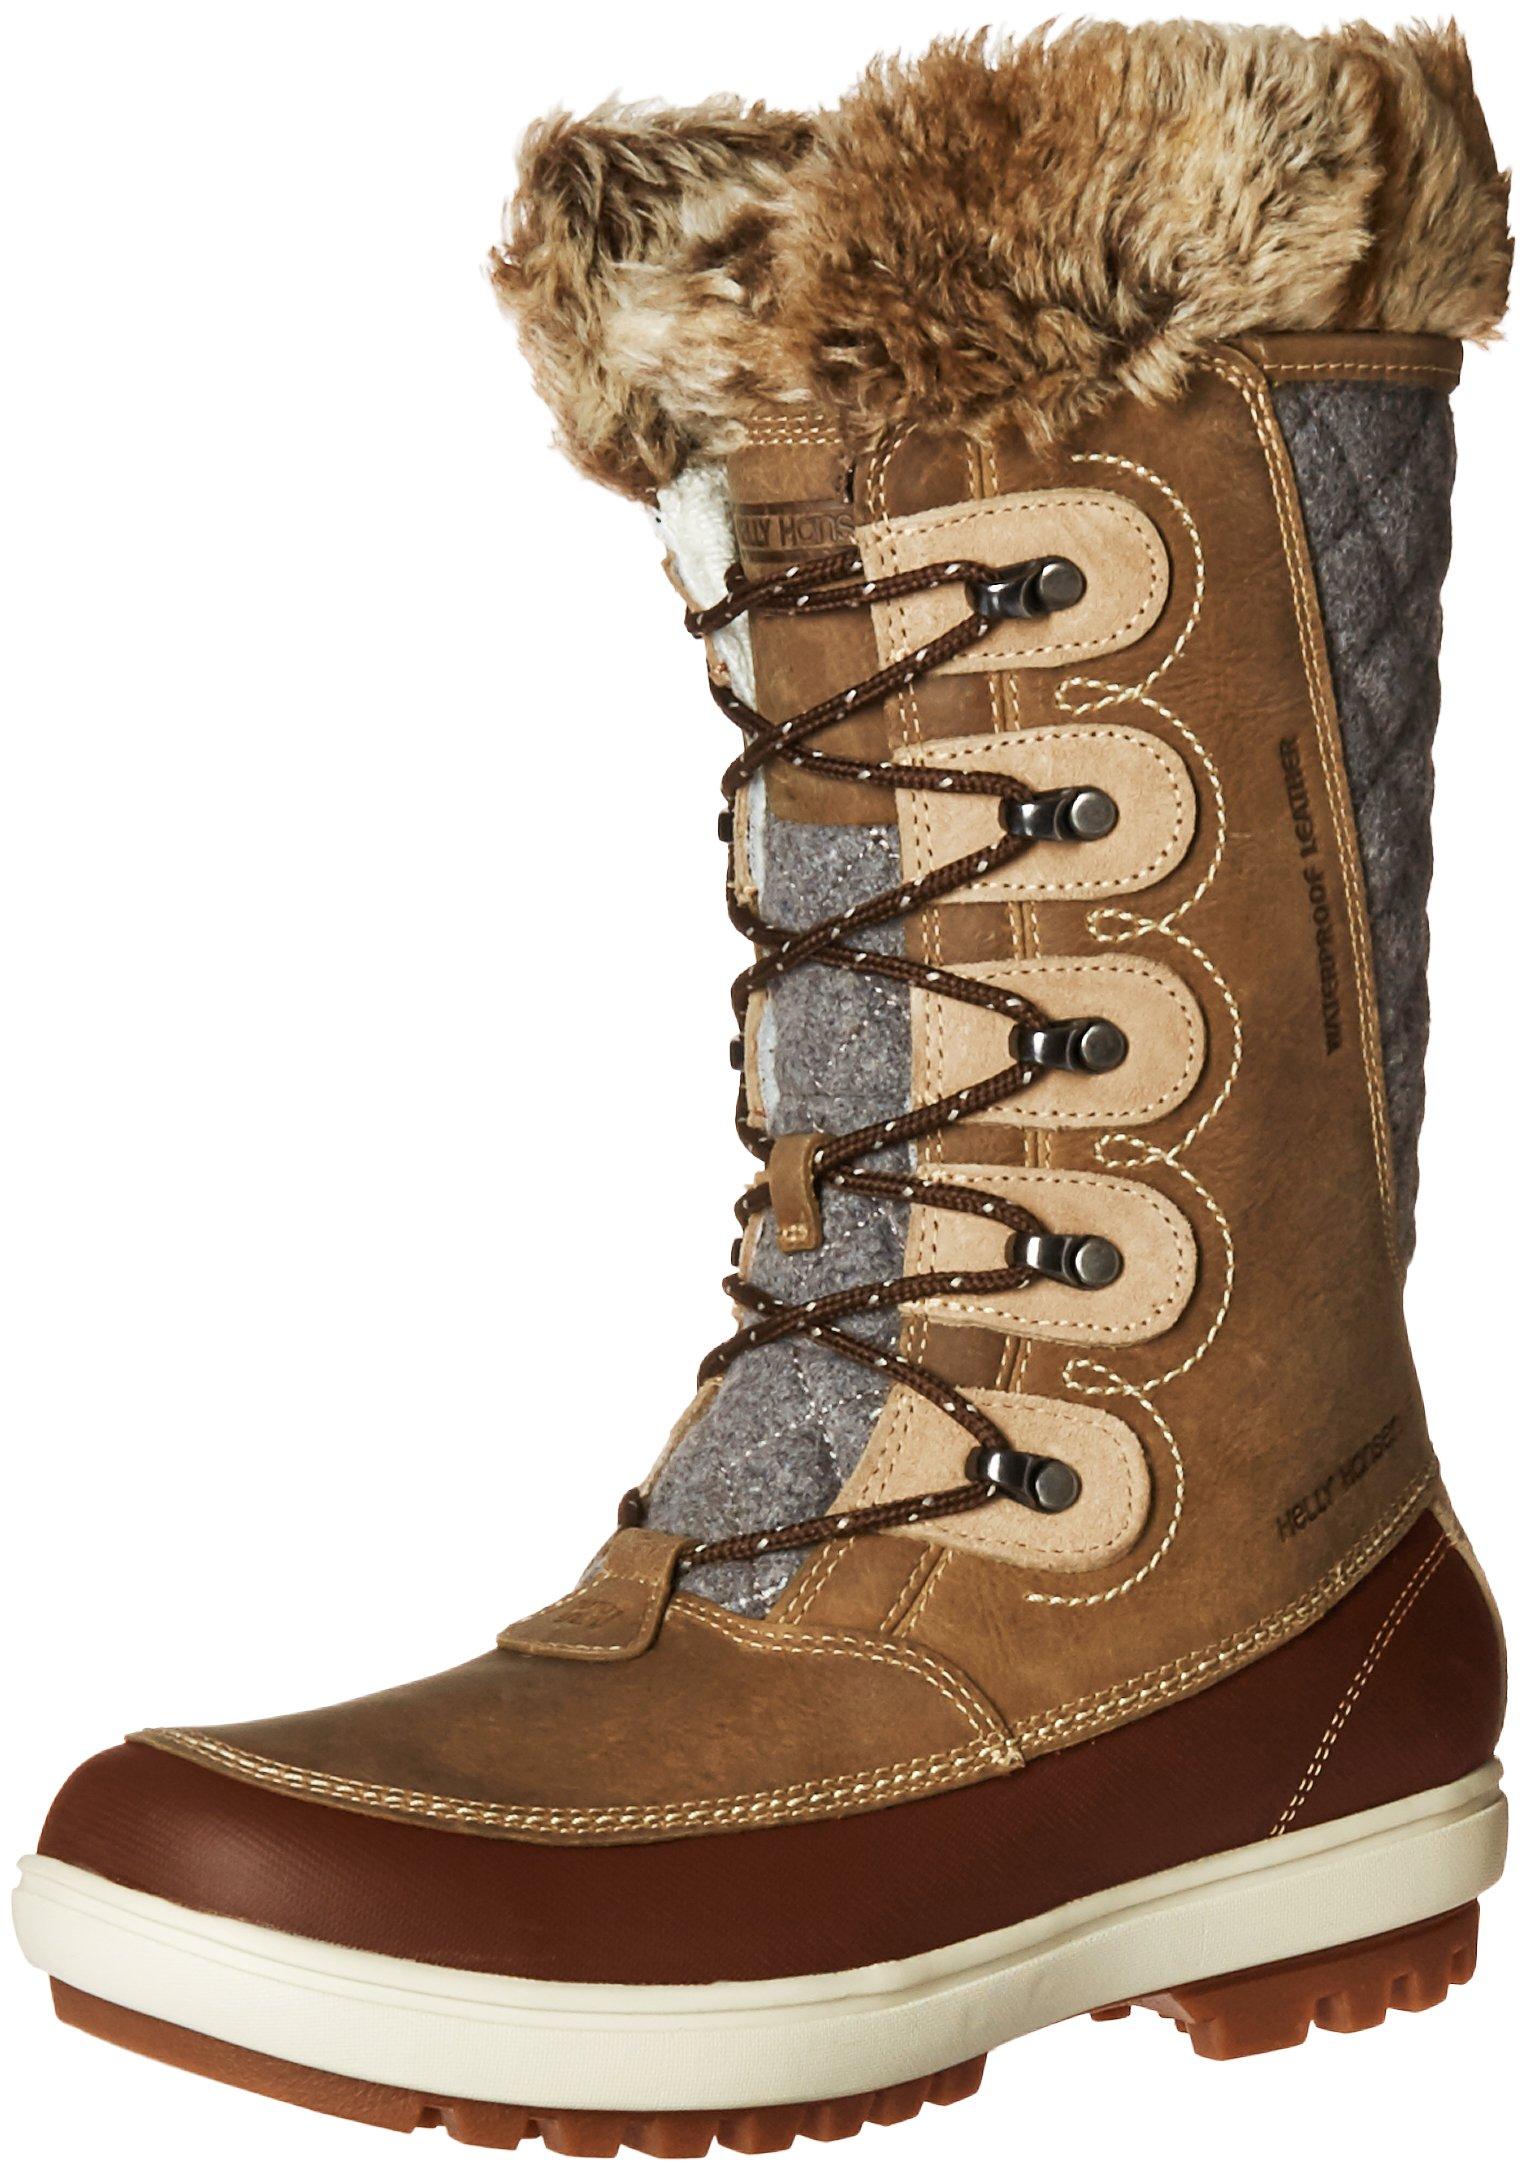 Helly Hansen Women's W Garibaldi VL-W Cold Weather Boot, Camel/Coffee Bean/Bungee Cord/Natural/Khaki/Angora/Sperry Gum, 9.5 M US